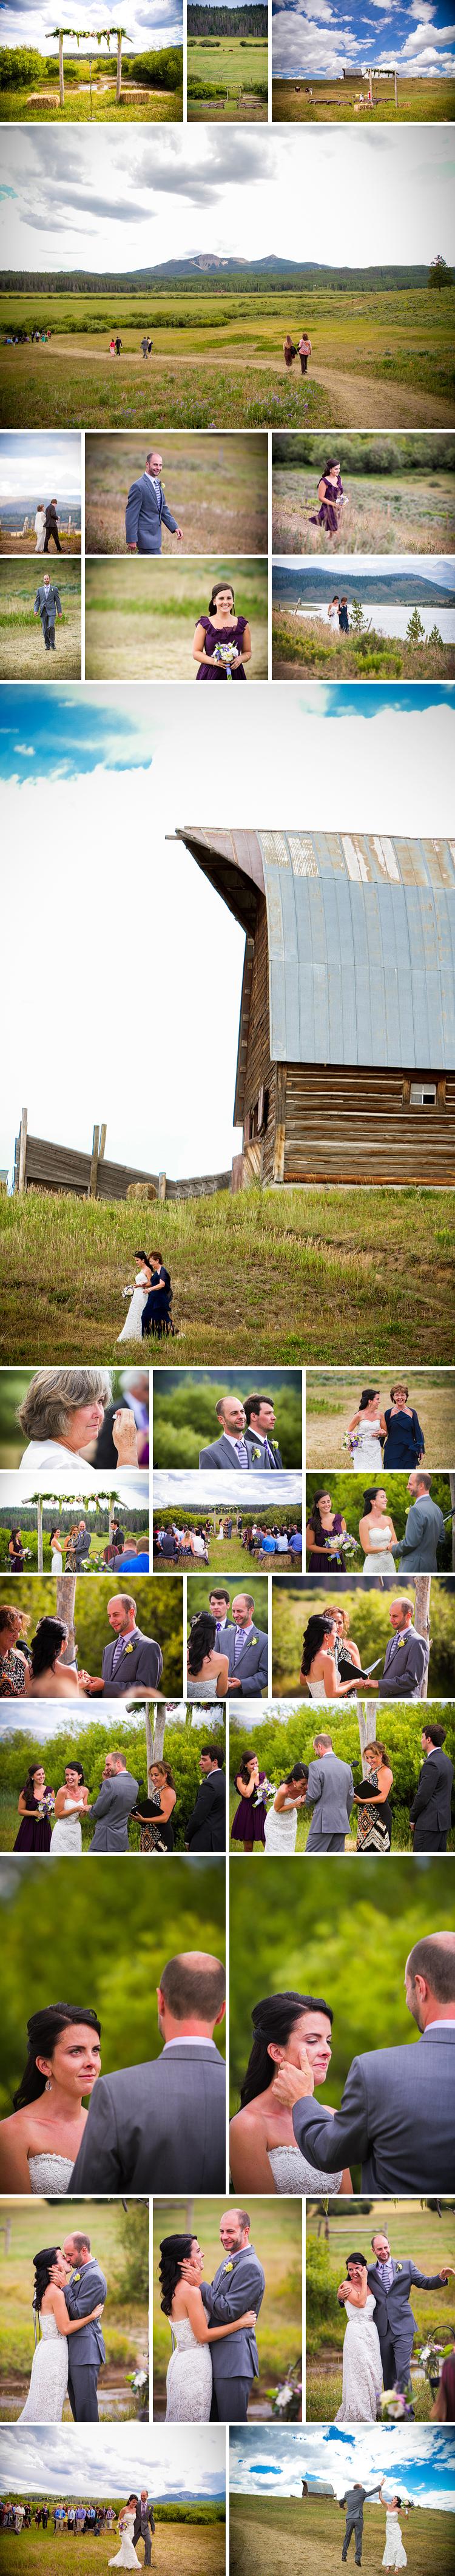 steamboat-springs-fetcher-barn-wedding02